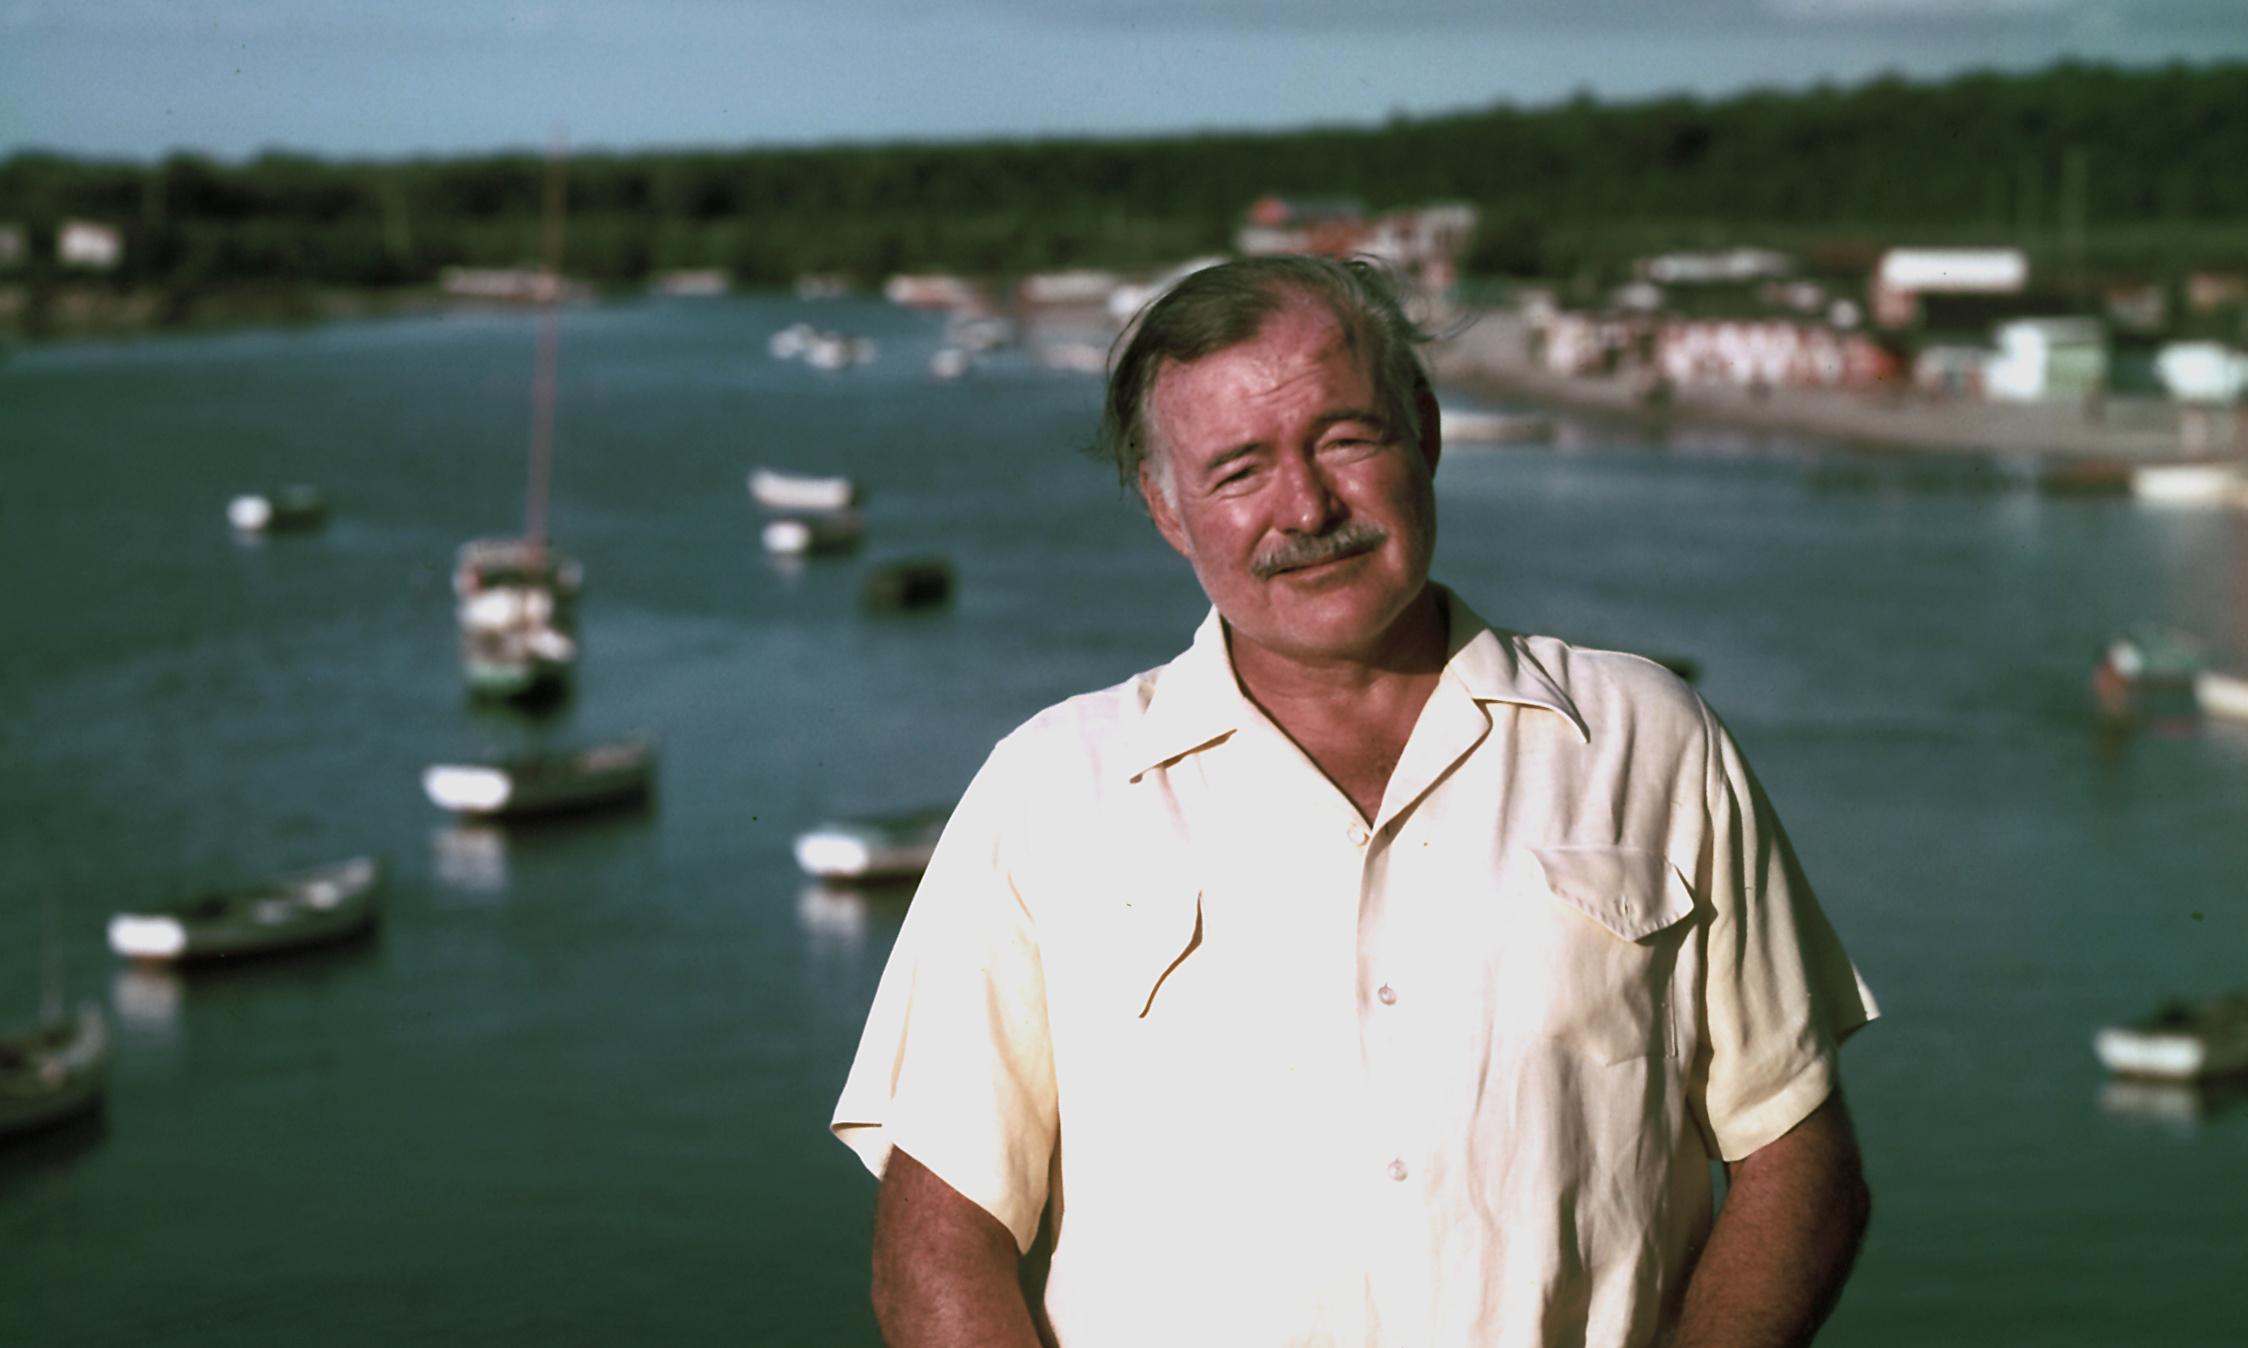 Did Ernest Hemingway copy his friend's ideas for Cuban classics?